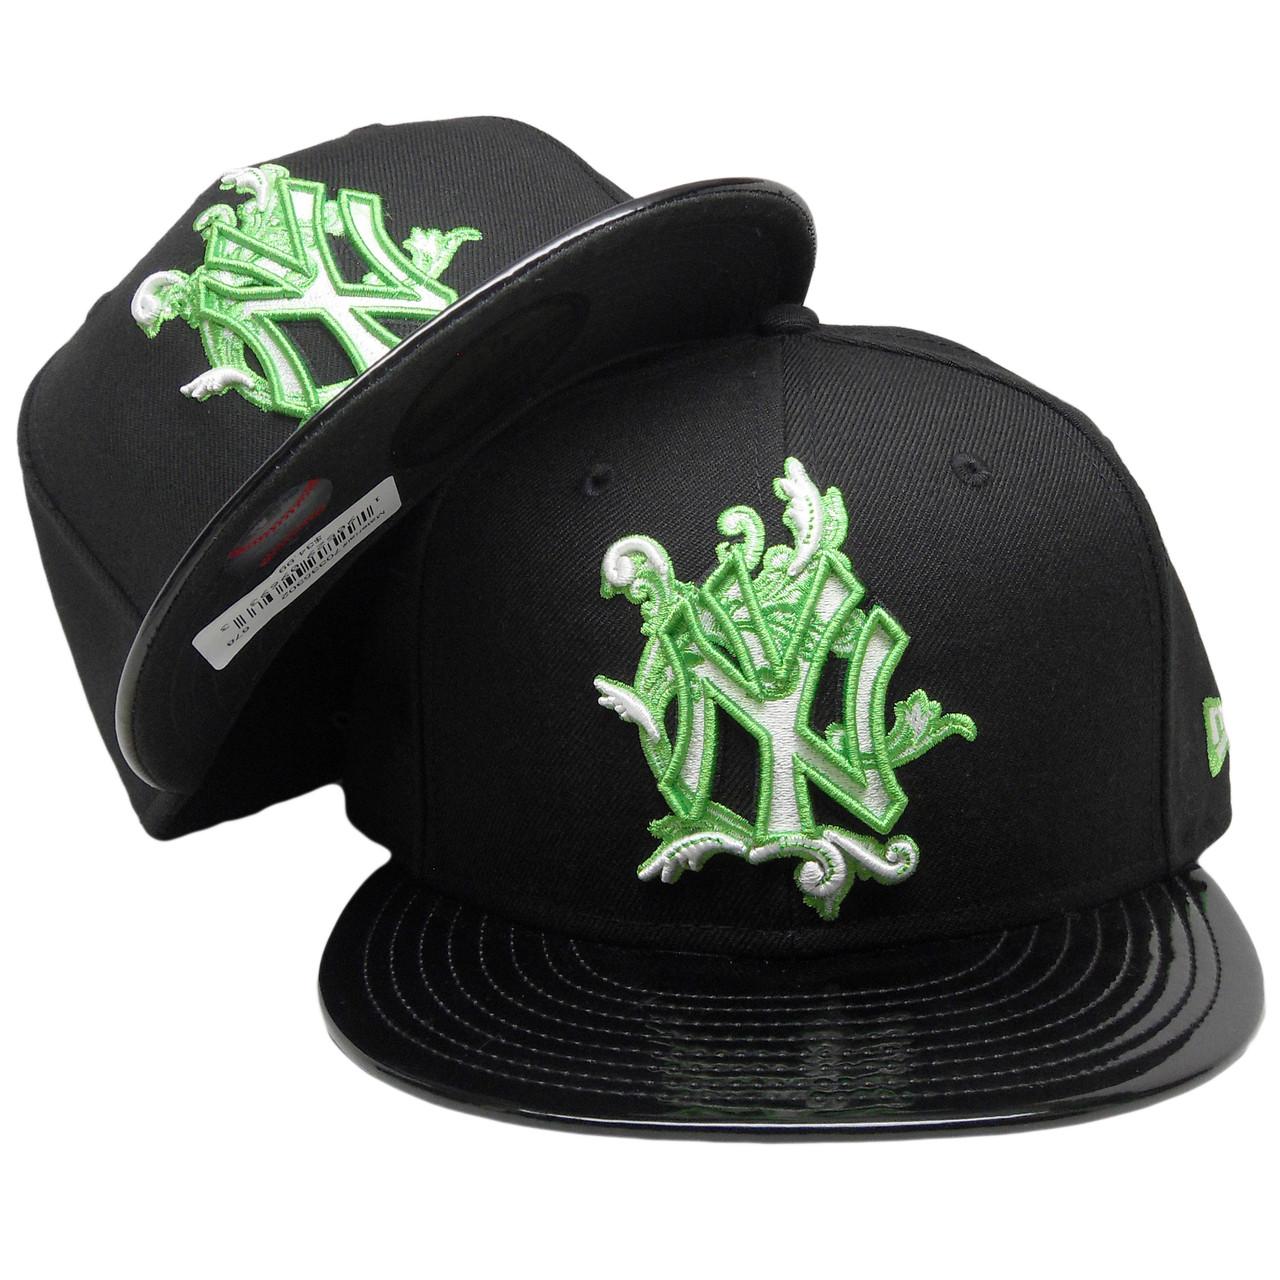 9288ea32 New York Yankees New Era Custom 59Fifty Fitted Hat - Black, Lime Green,  White